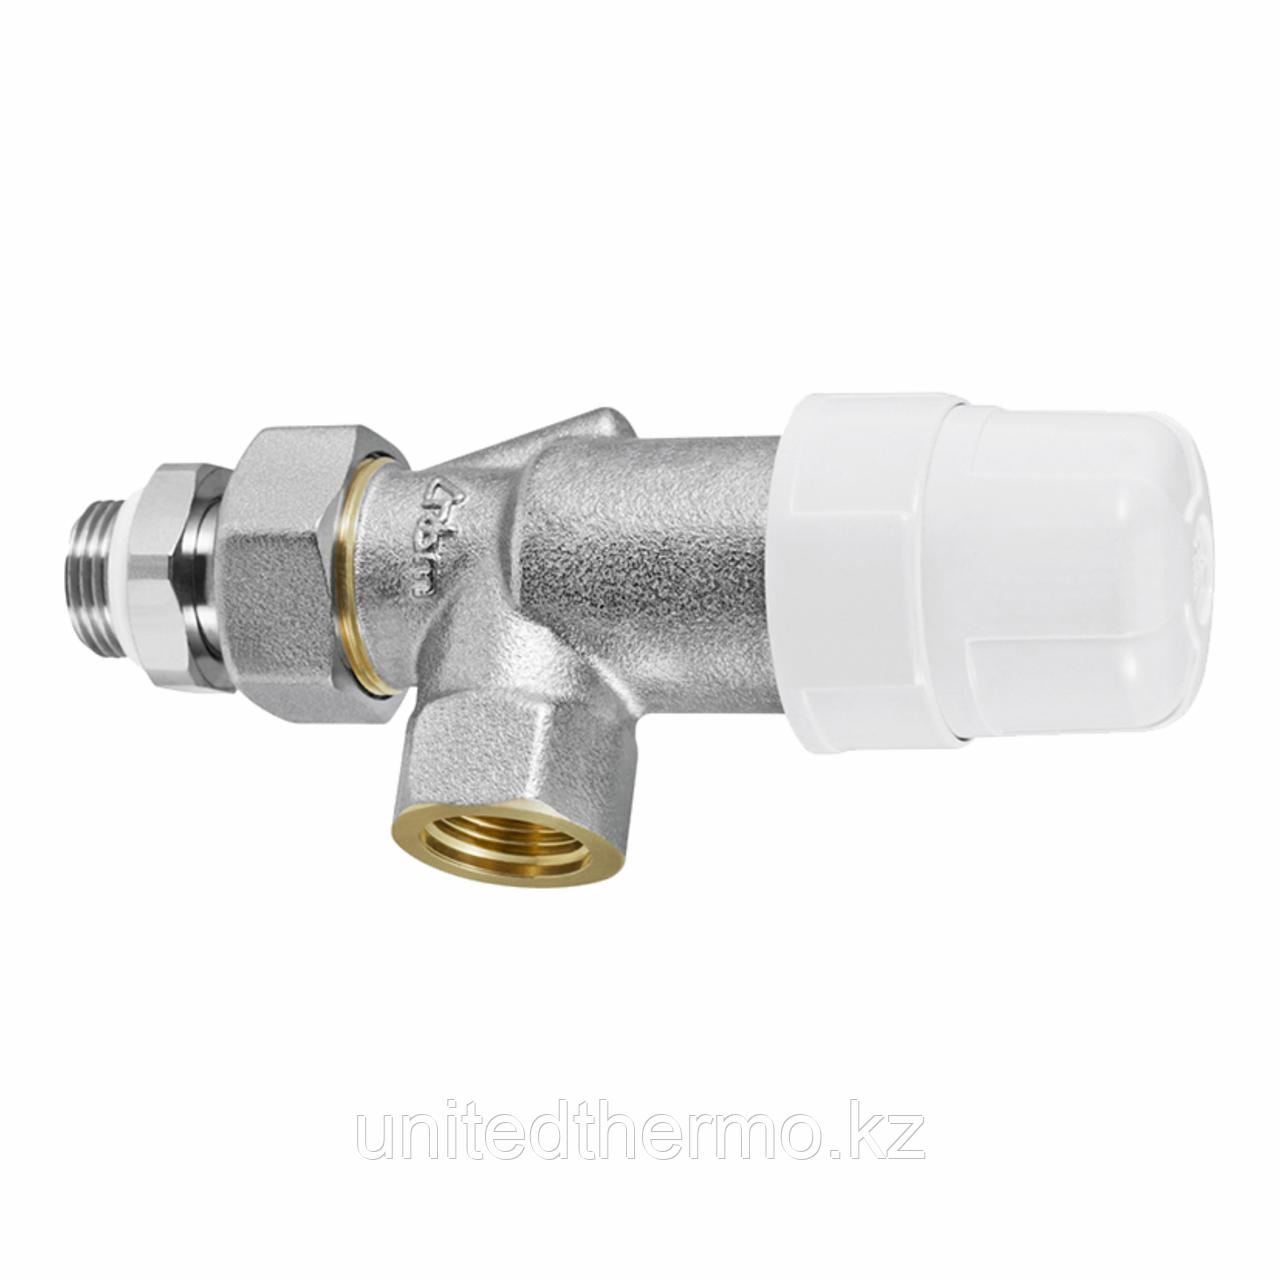 "Осевой 1/2"" терморегулирующий клапан RBM"